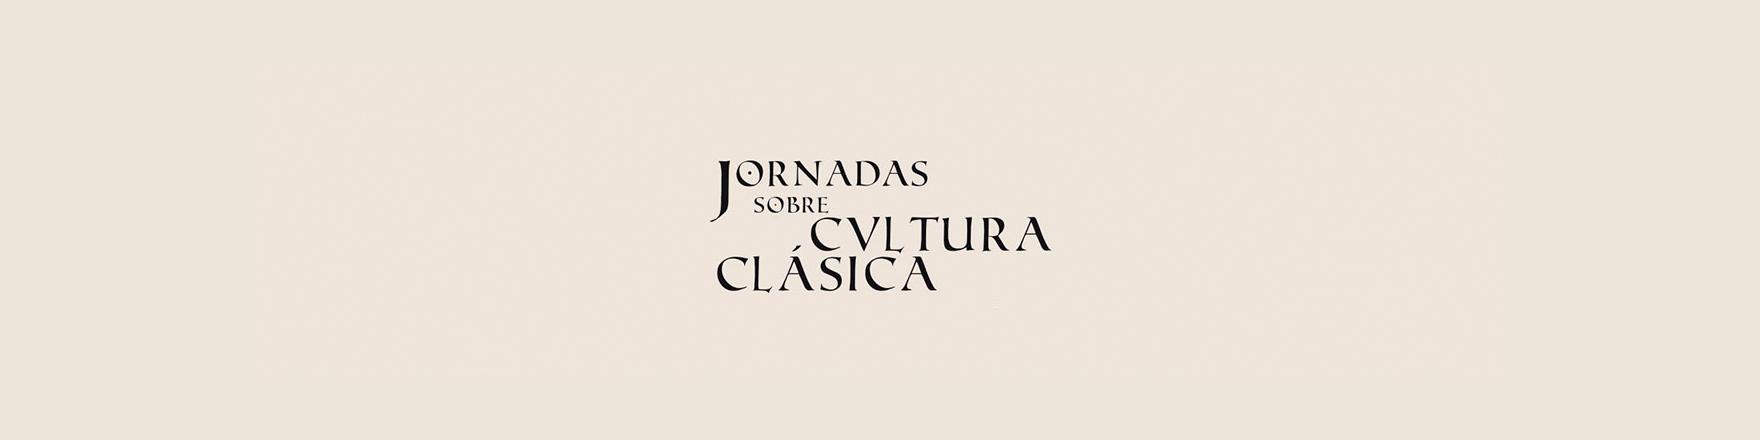 jornadas cultura clasica bg seccion